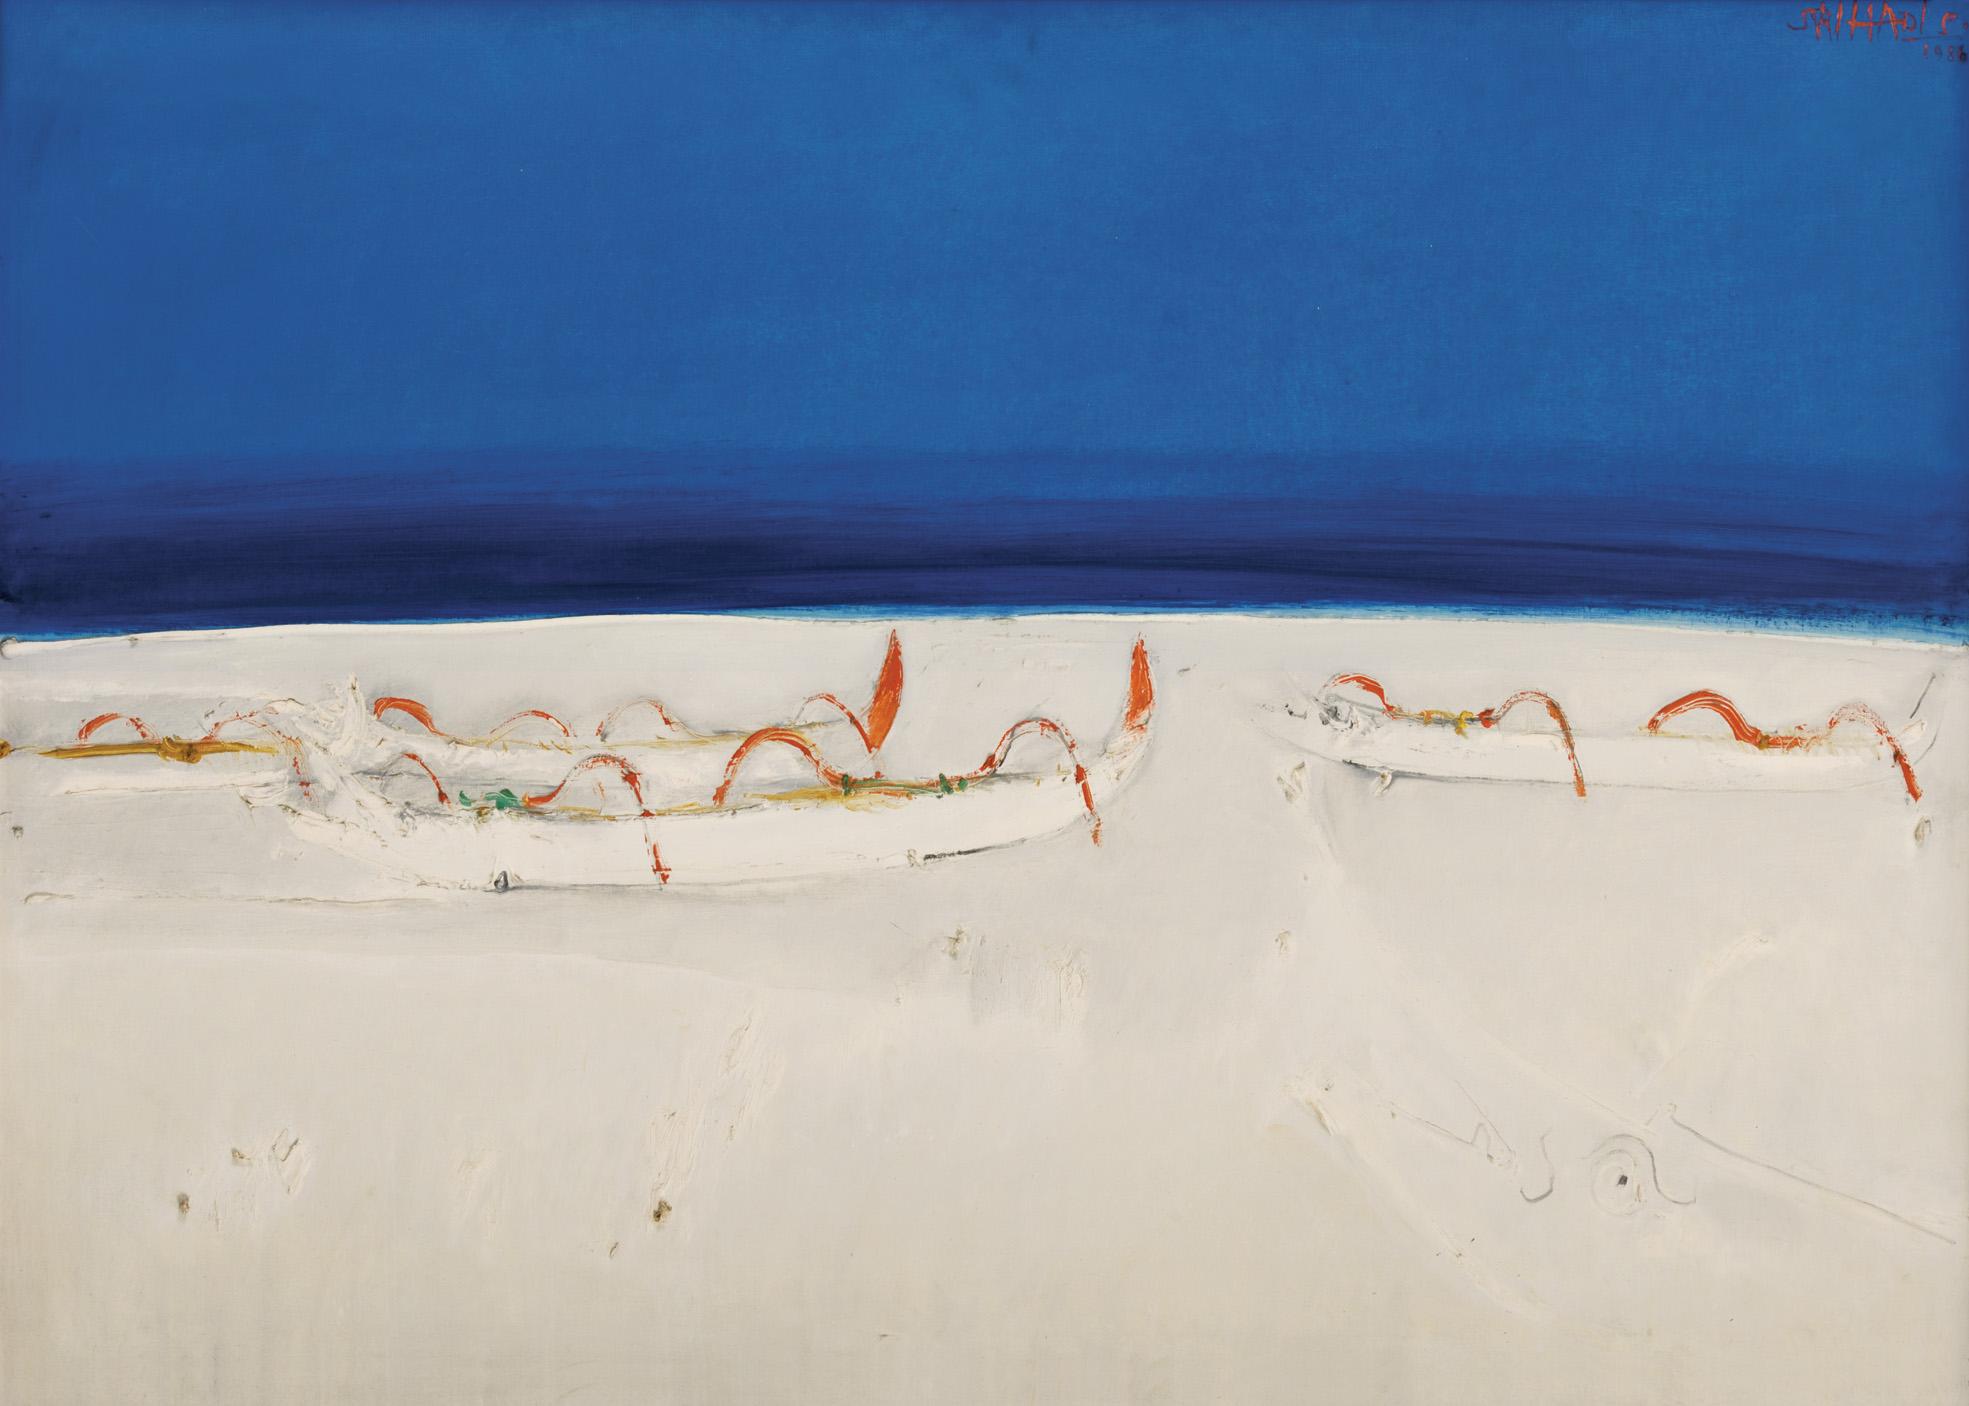 Srihadi Soedarsono, Horizon and the Fishing Boats, oil on canvas, 100 x 140 cm, 1986